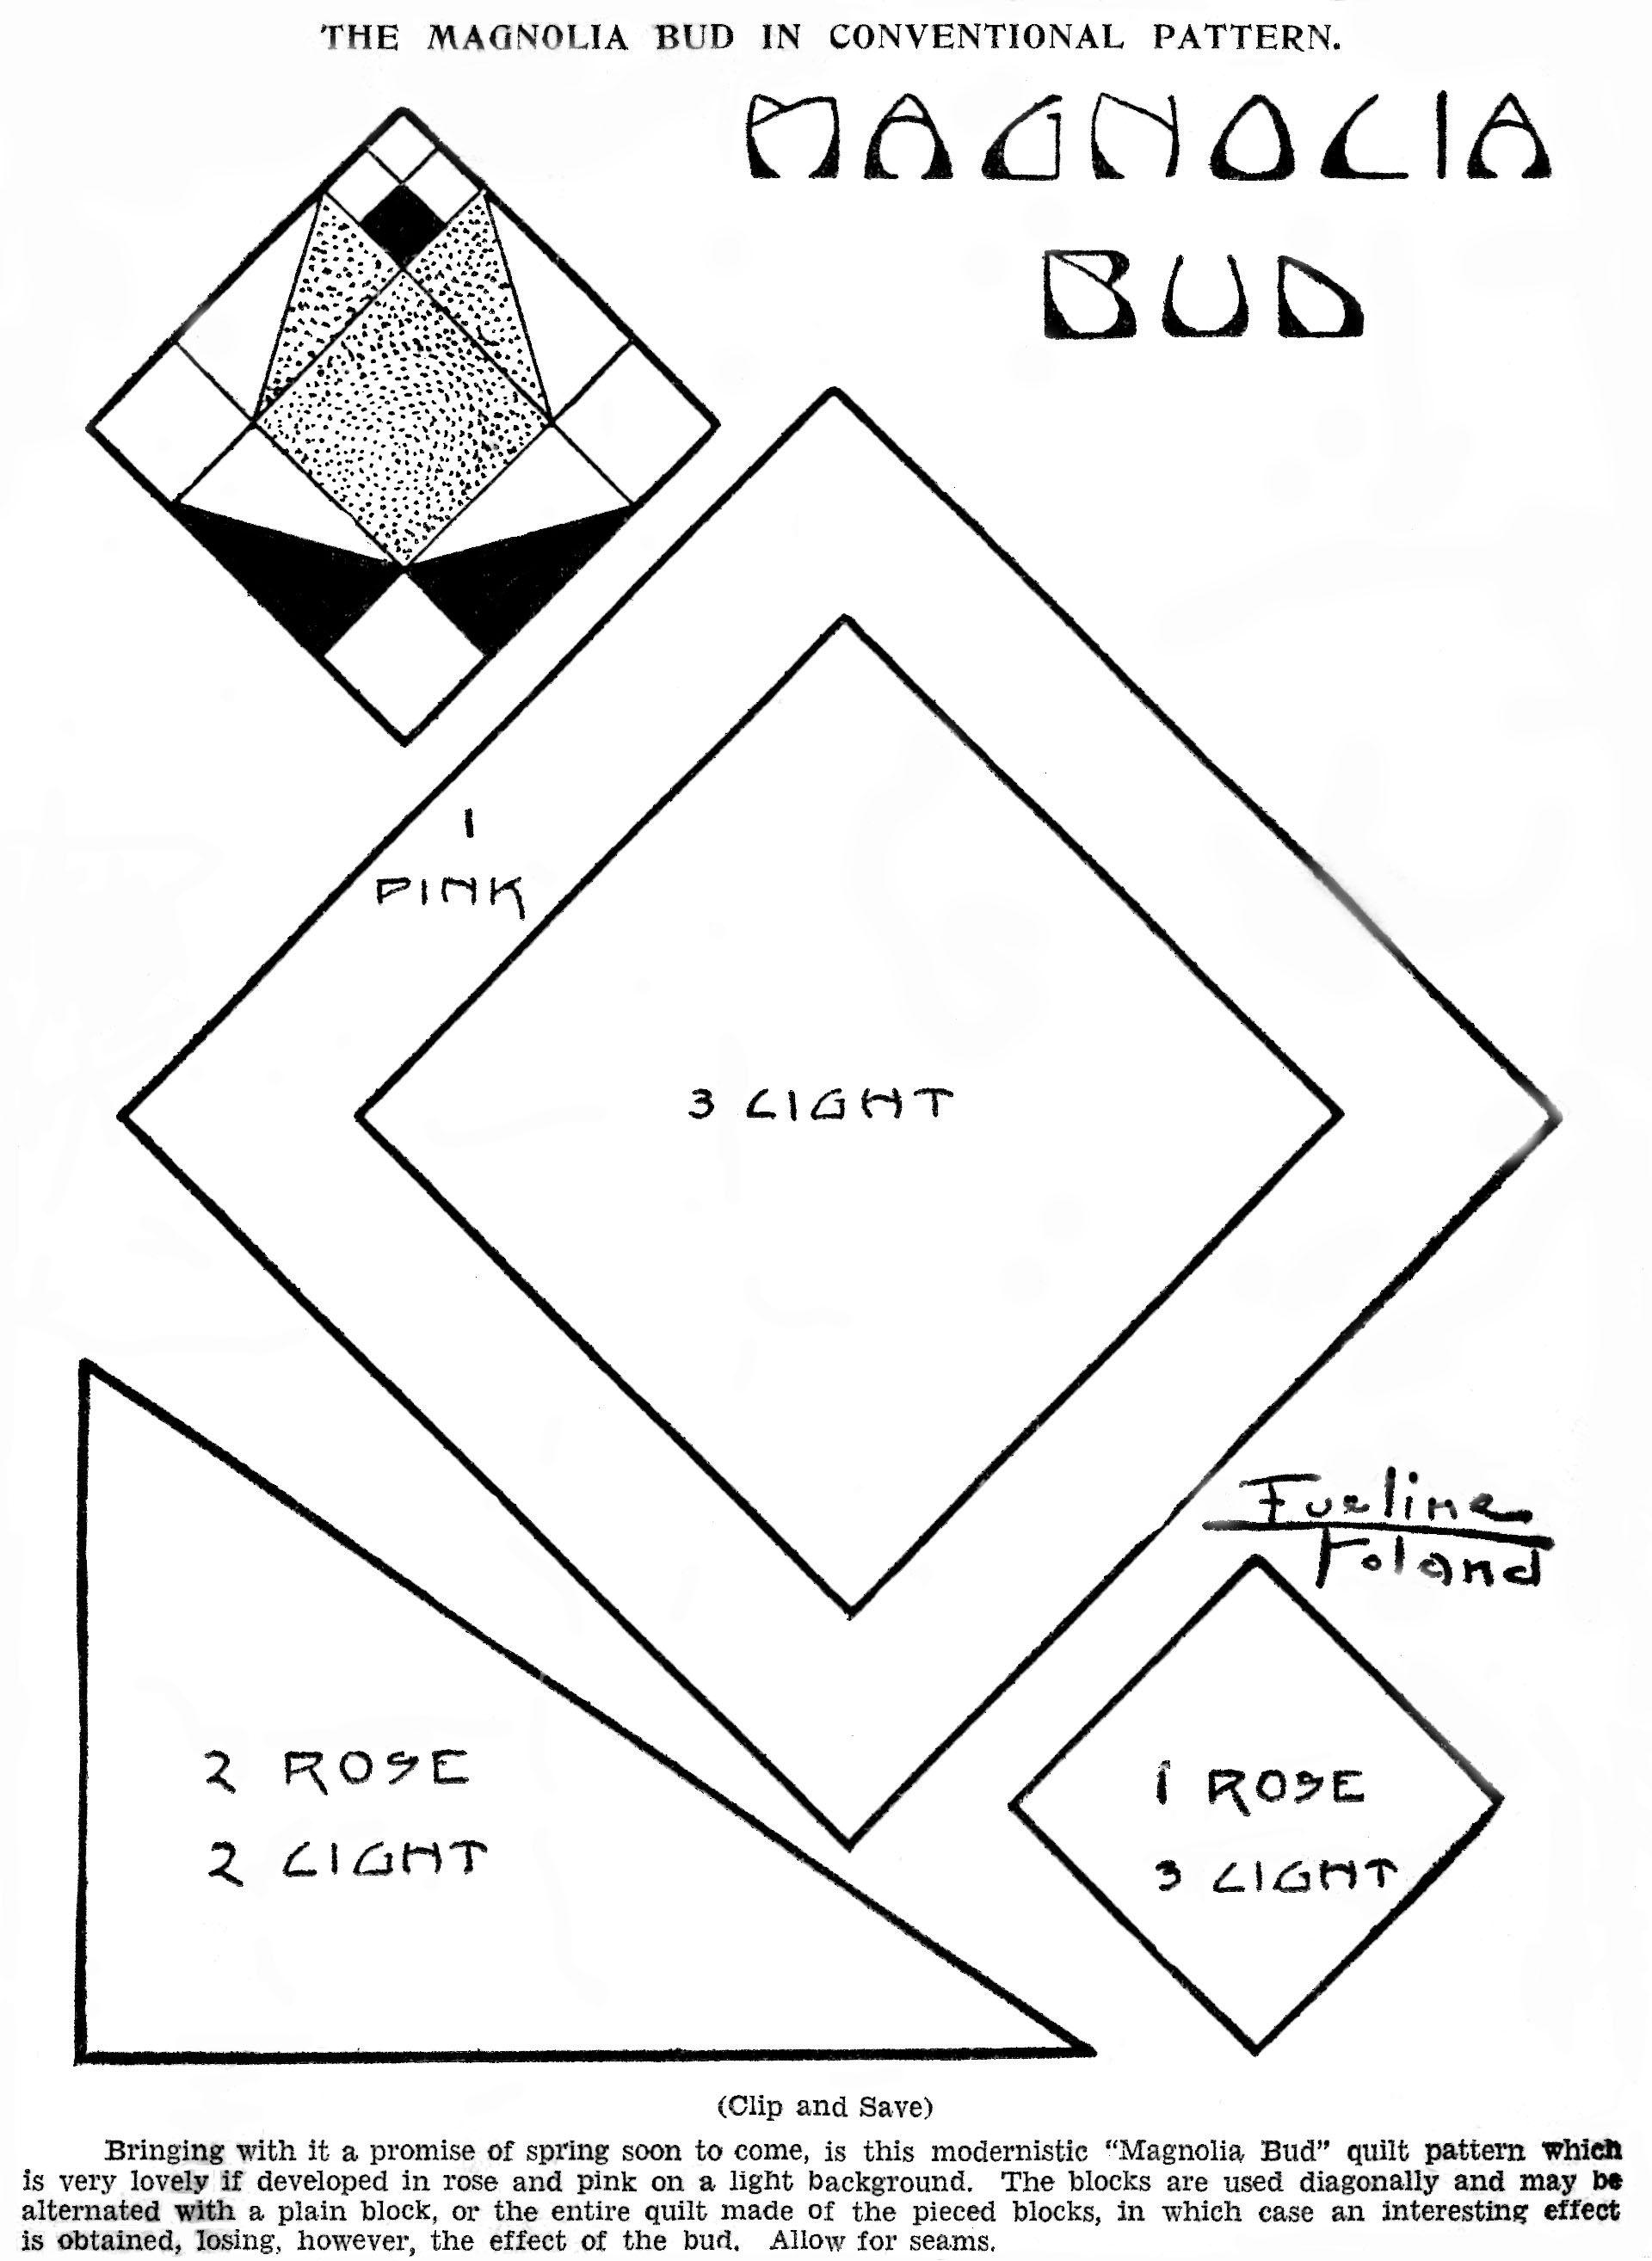 1930s Magnolia Bud Kansas City Star Quilt Pattern